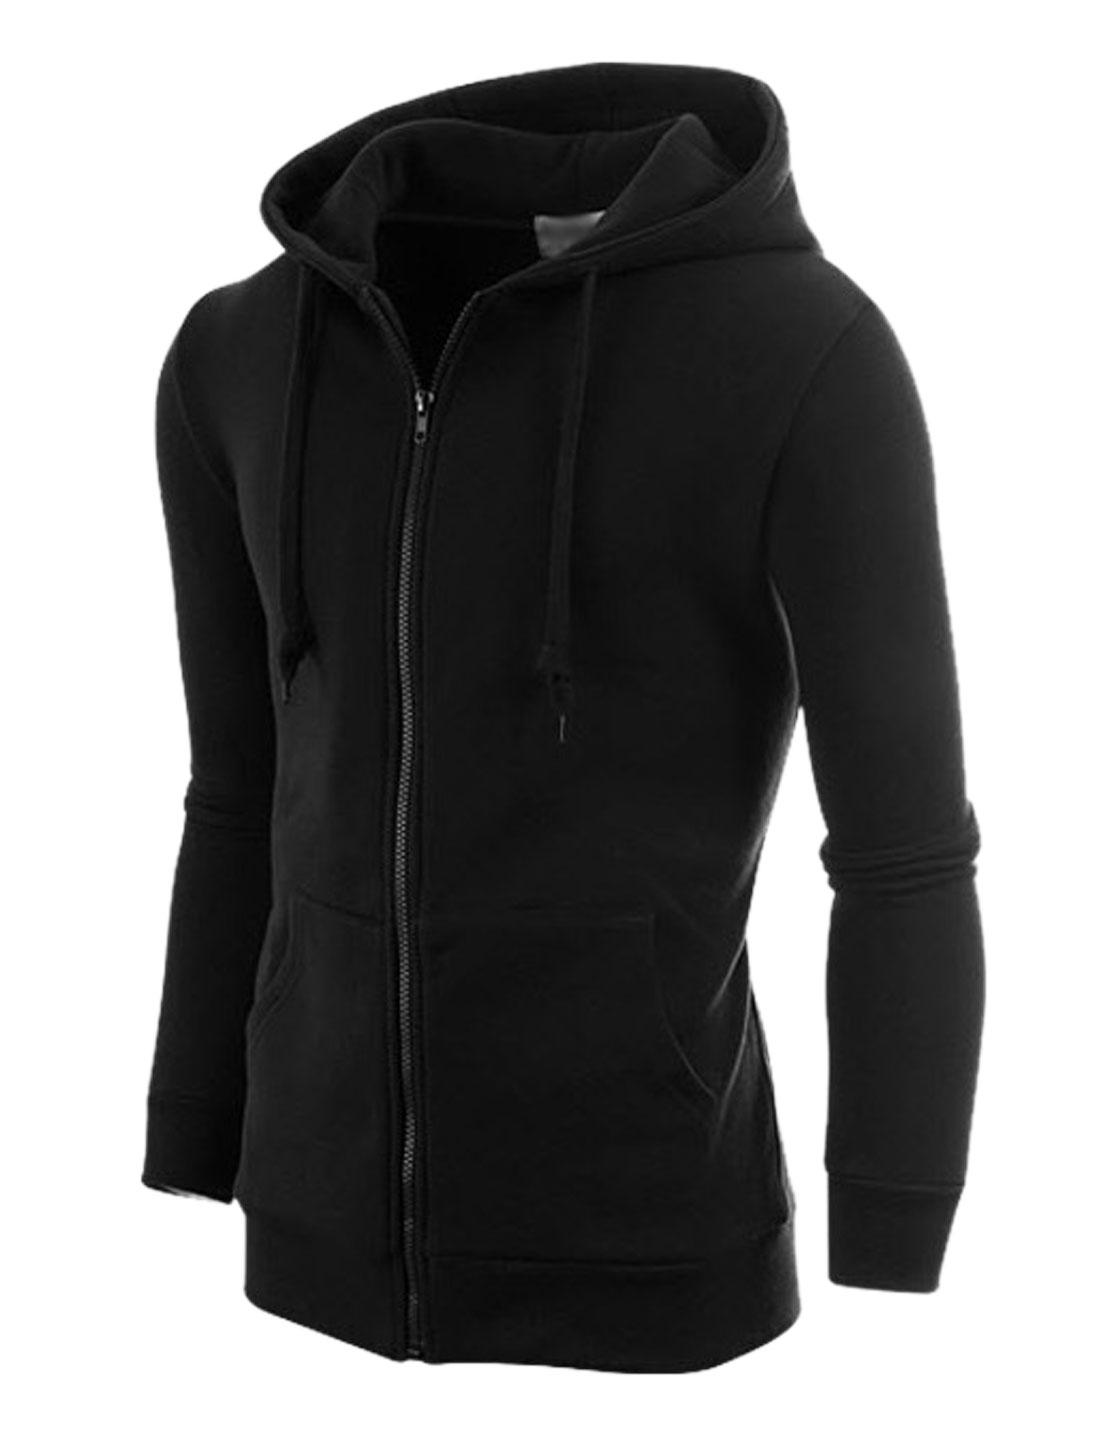 Men Black Zip Up Front Pockets Drawstring Ribbed Trim Hoodie Jacket M